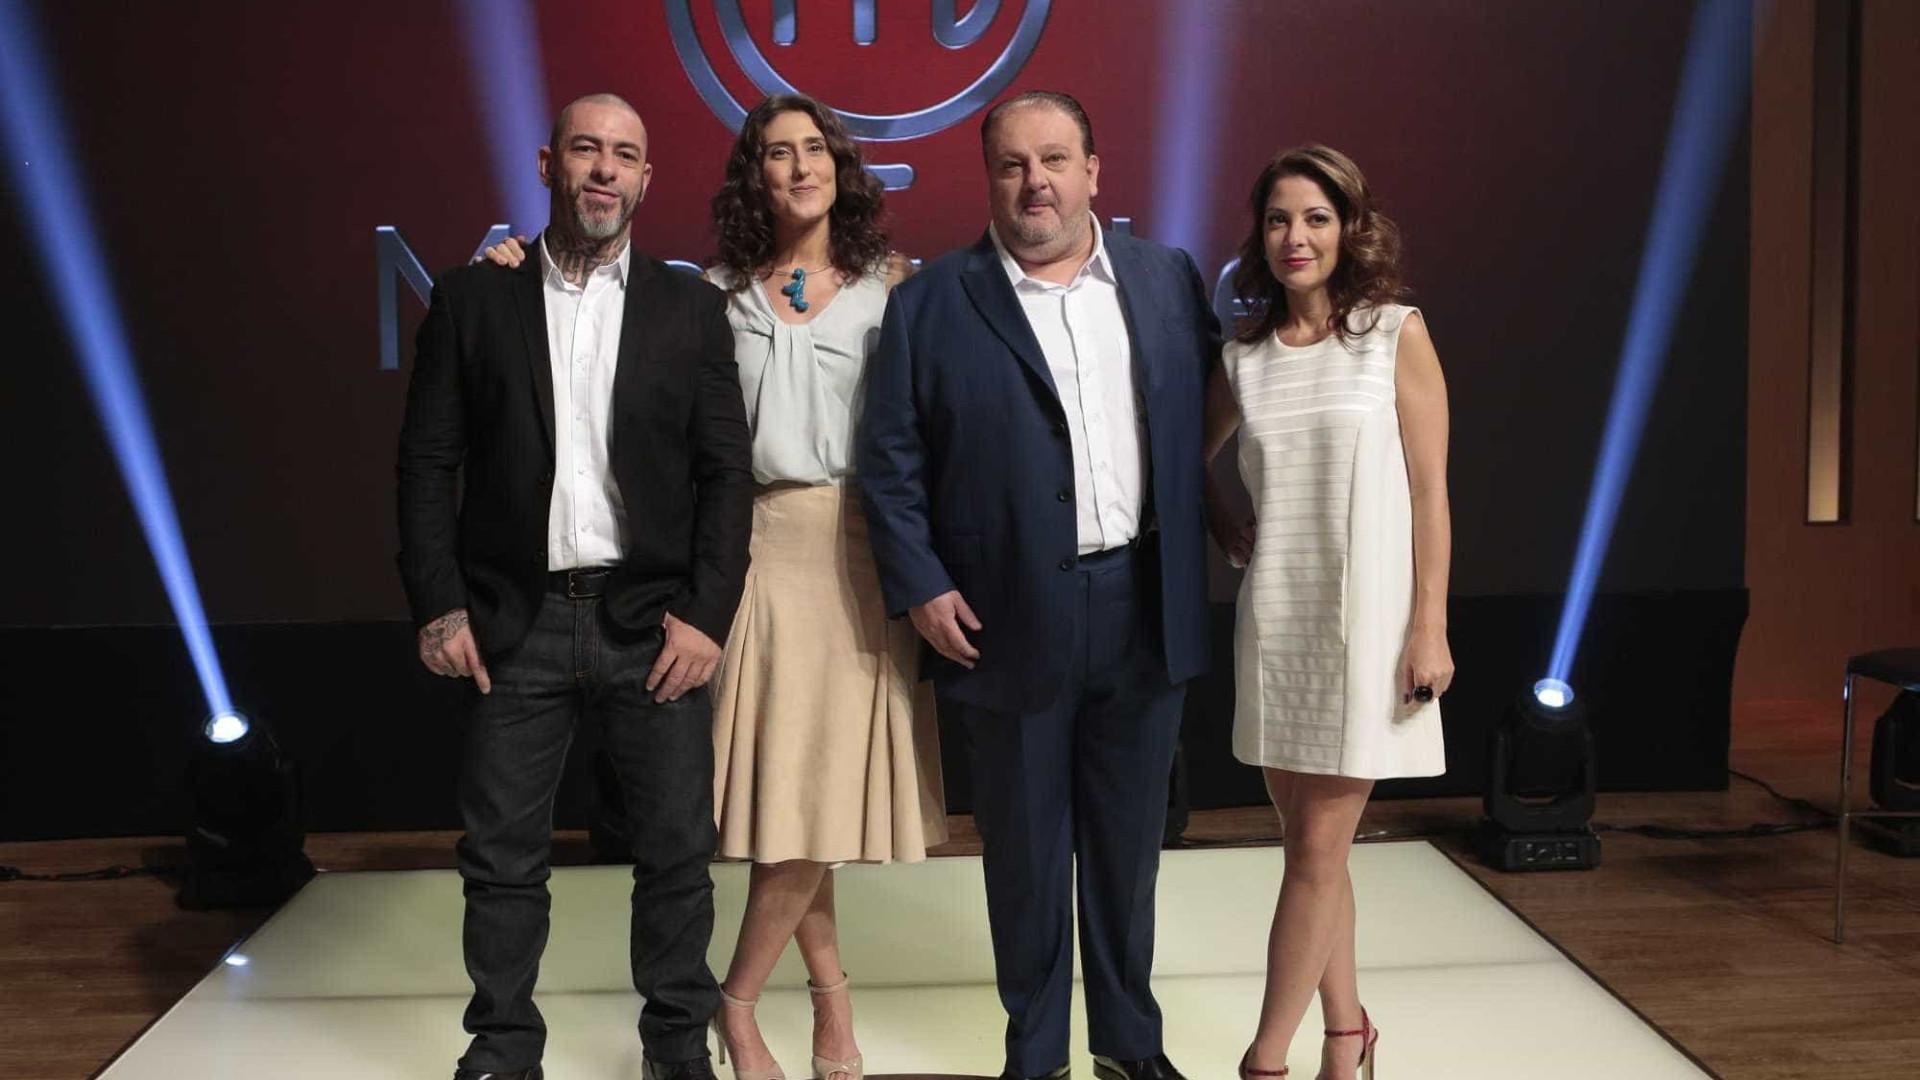 'MasterChef' aumenta prêmio e vencedor  receberá R$ 200 mil